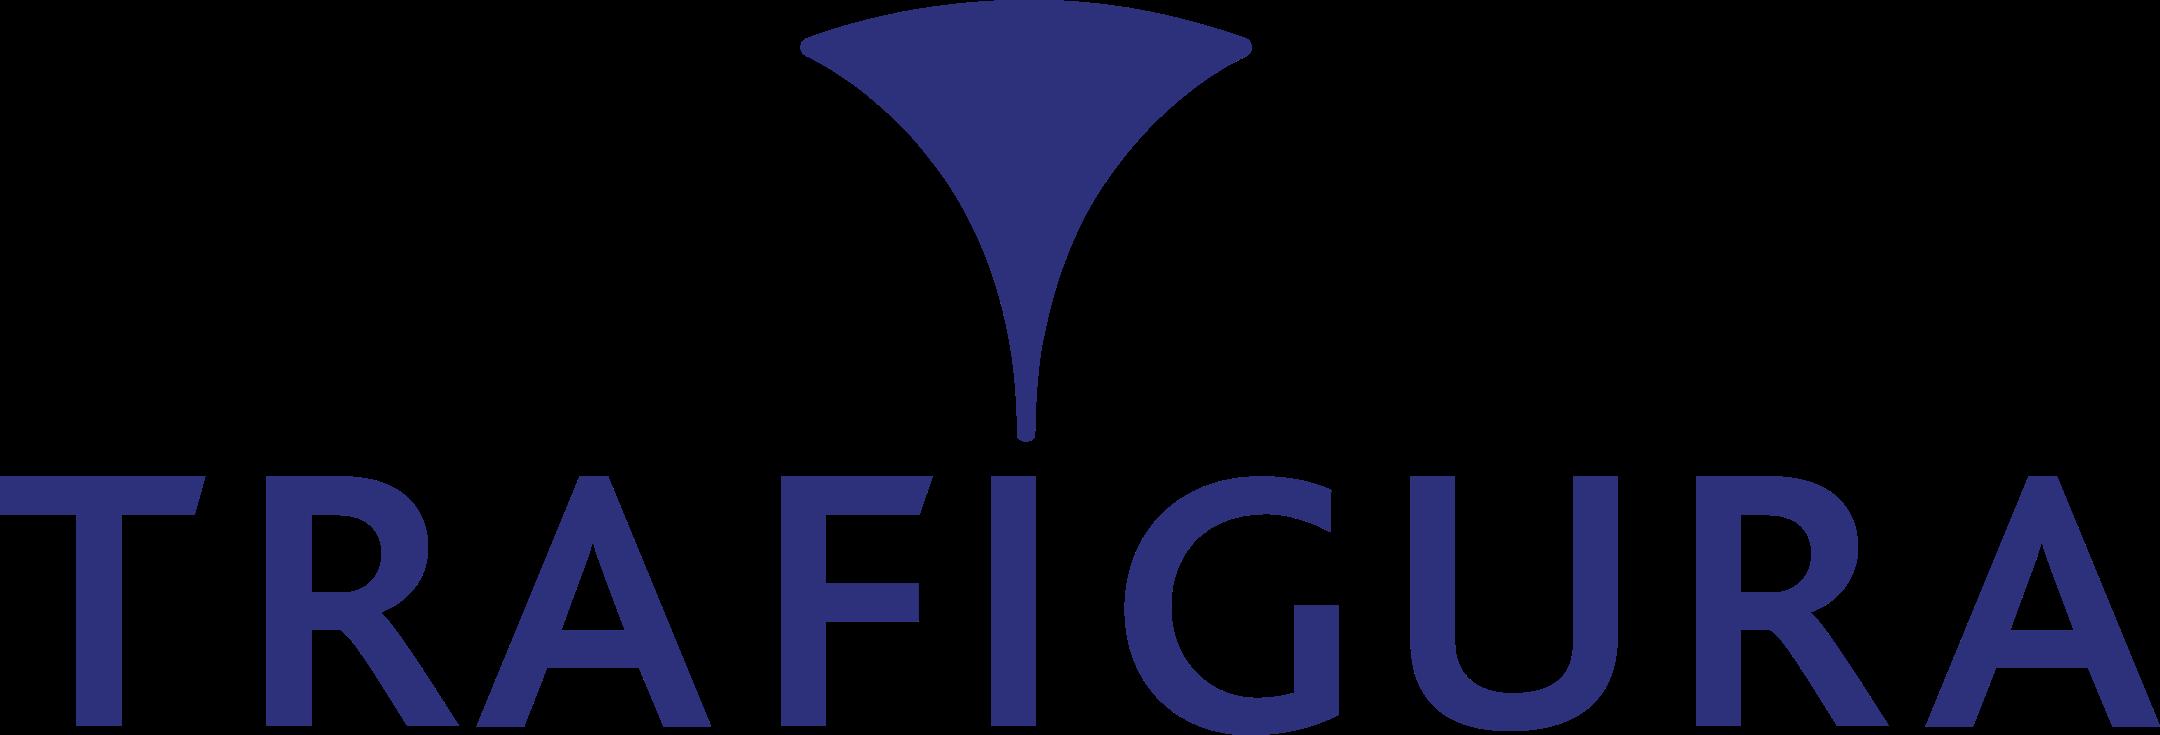 trafigura logo 1 - Trafigura Logo